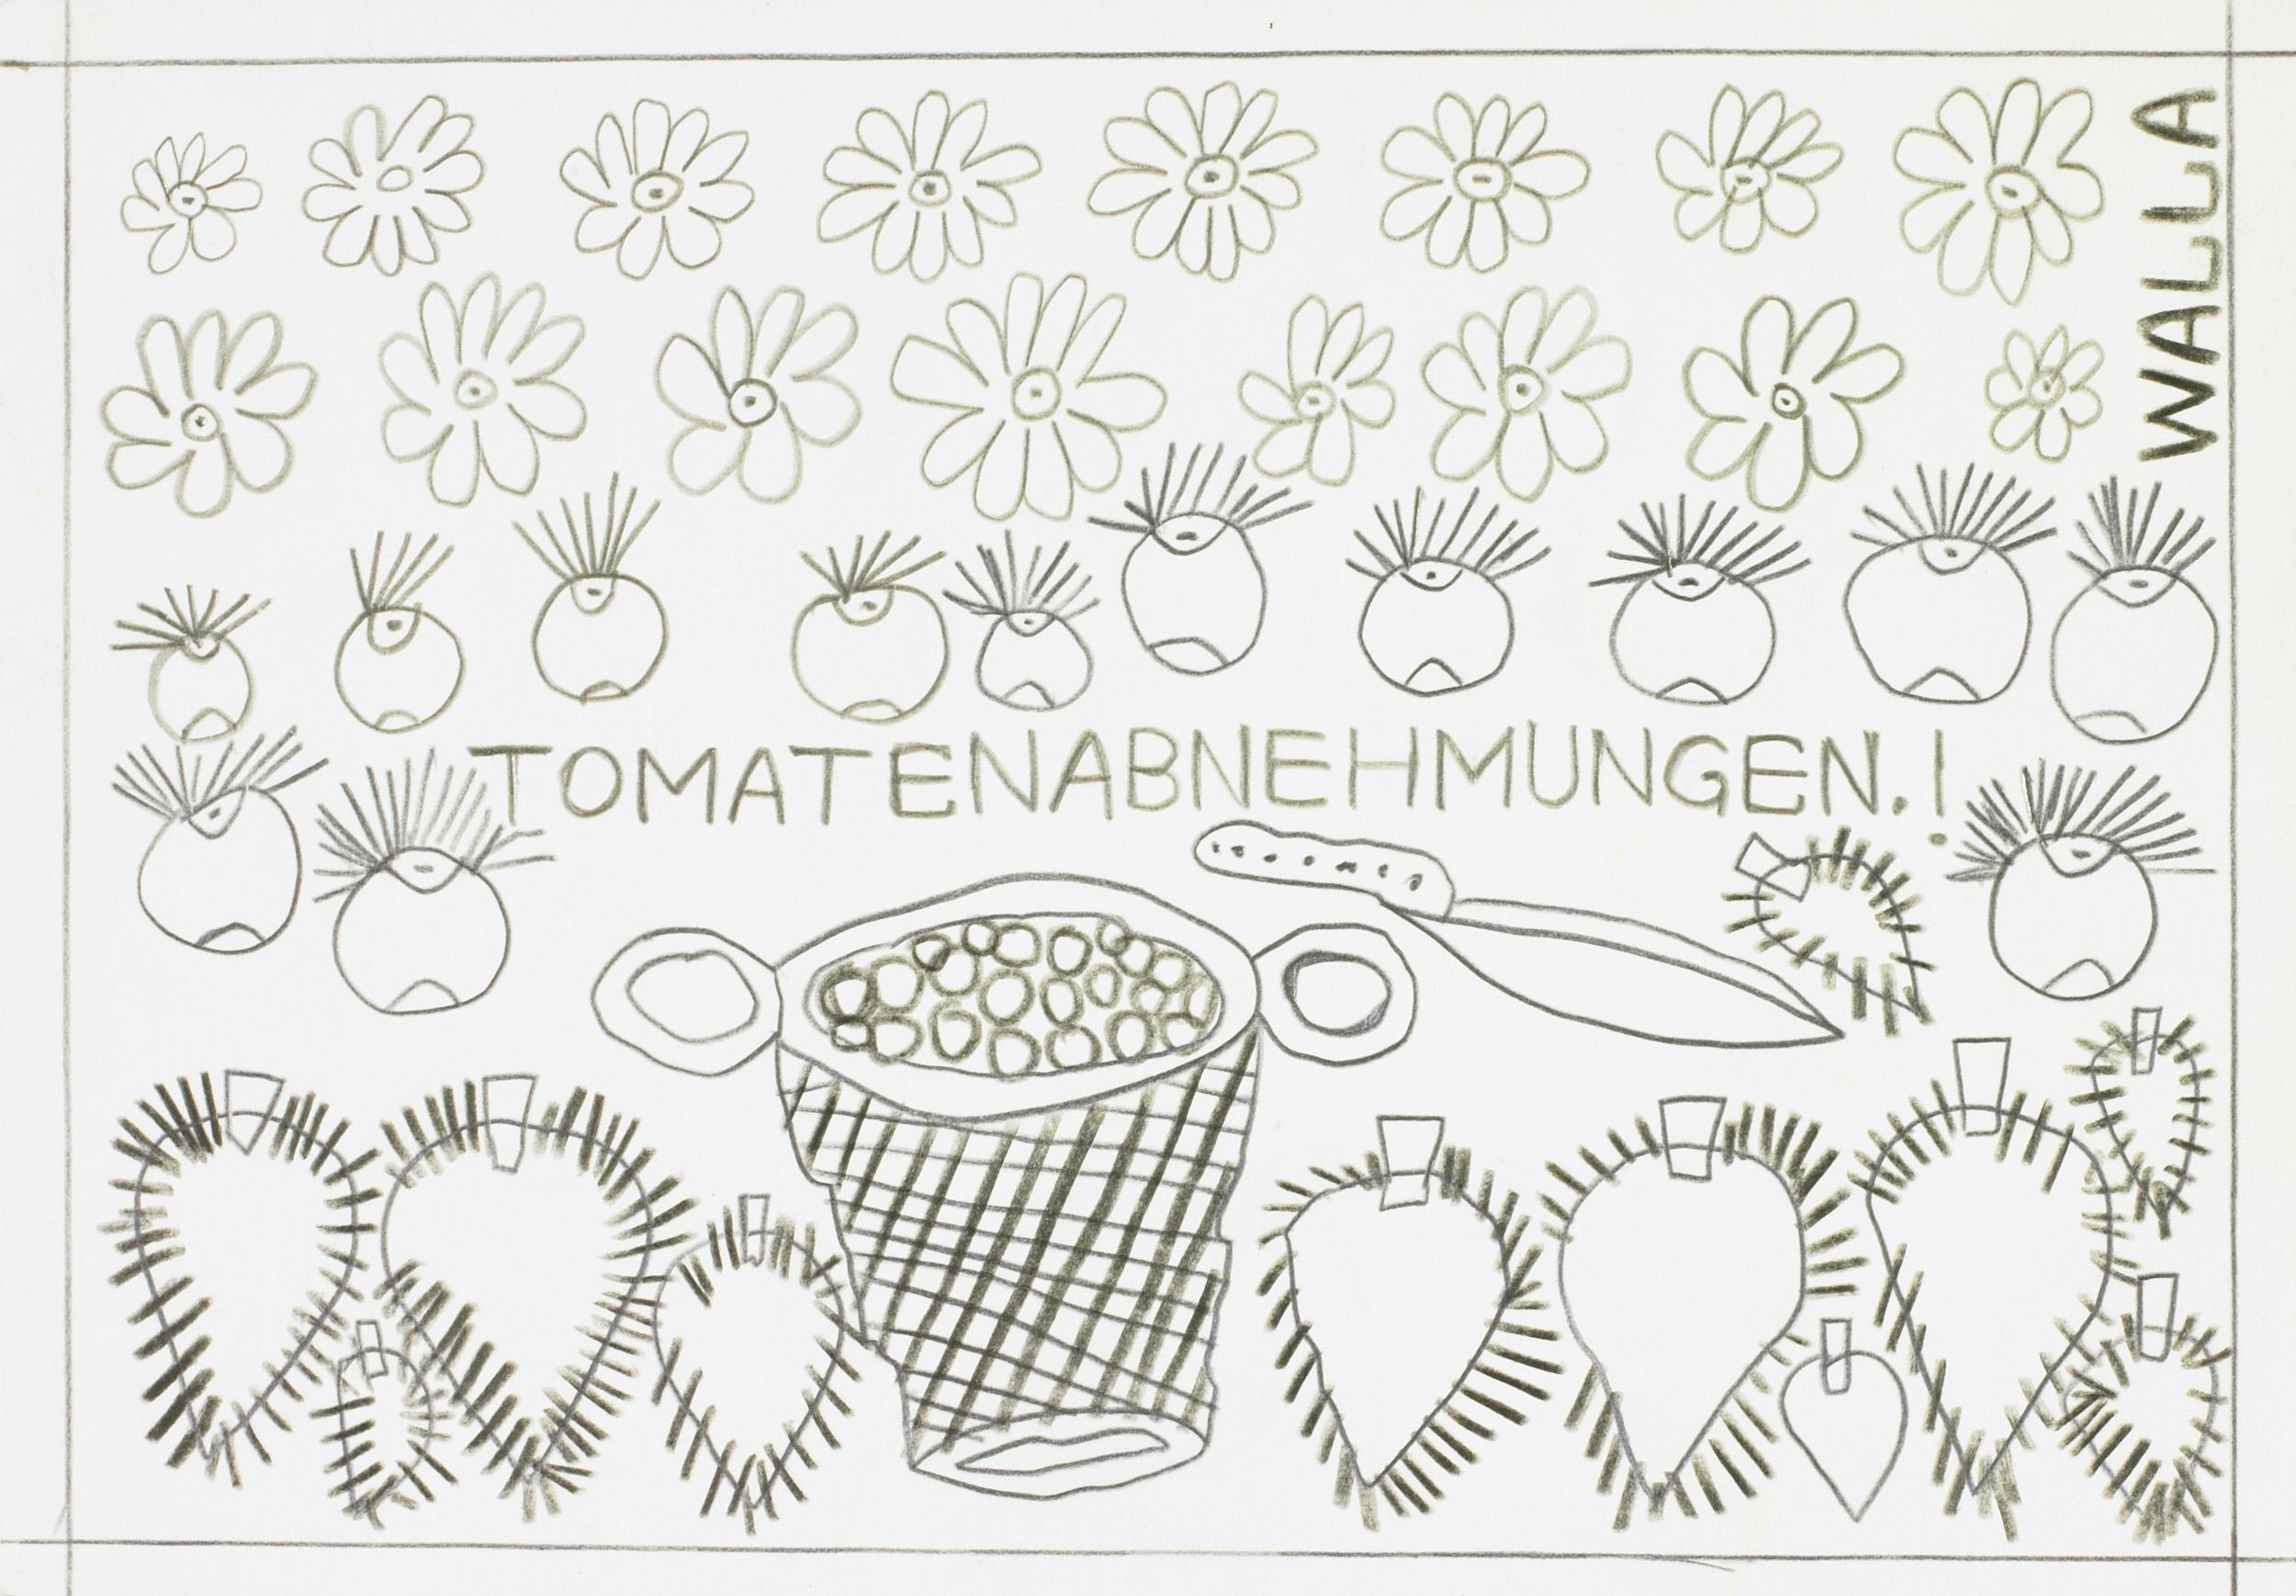 walla august - TOMATENABNEHMUNGEN.! / TOMATO PICKUPS.!